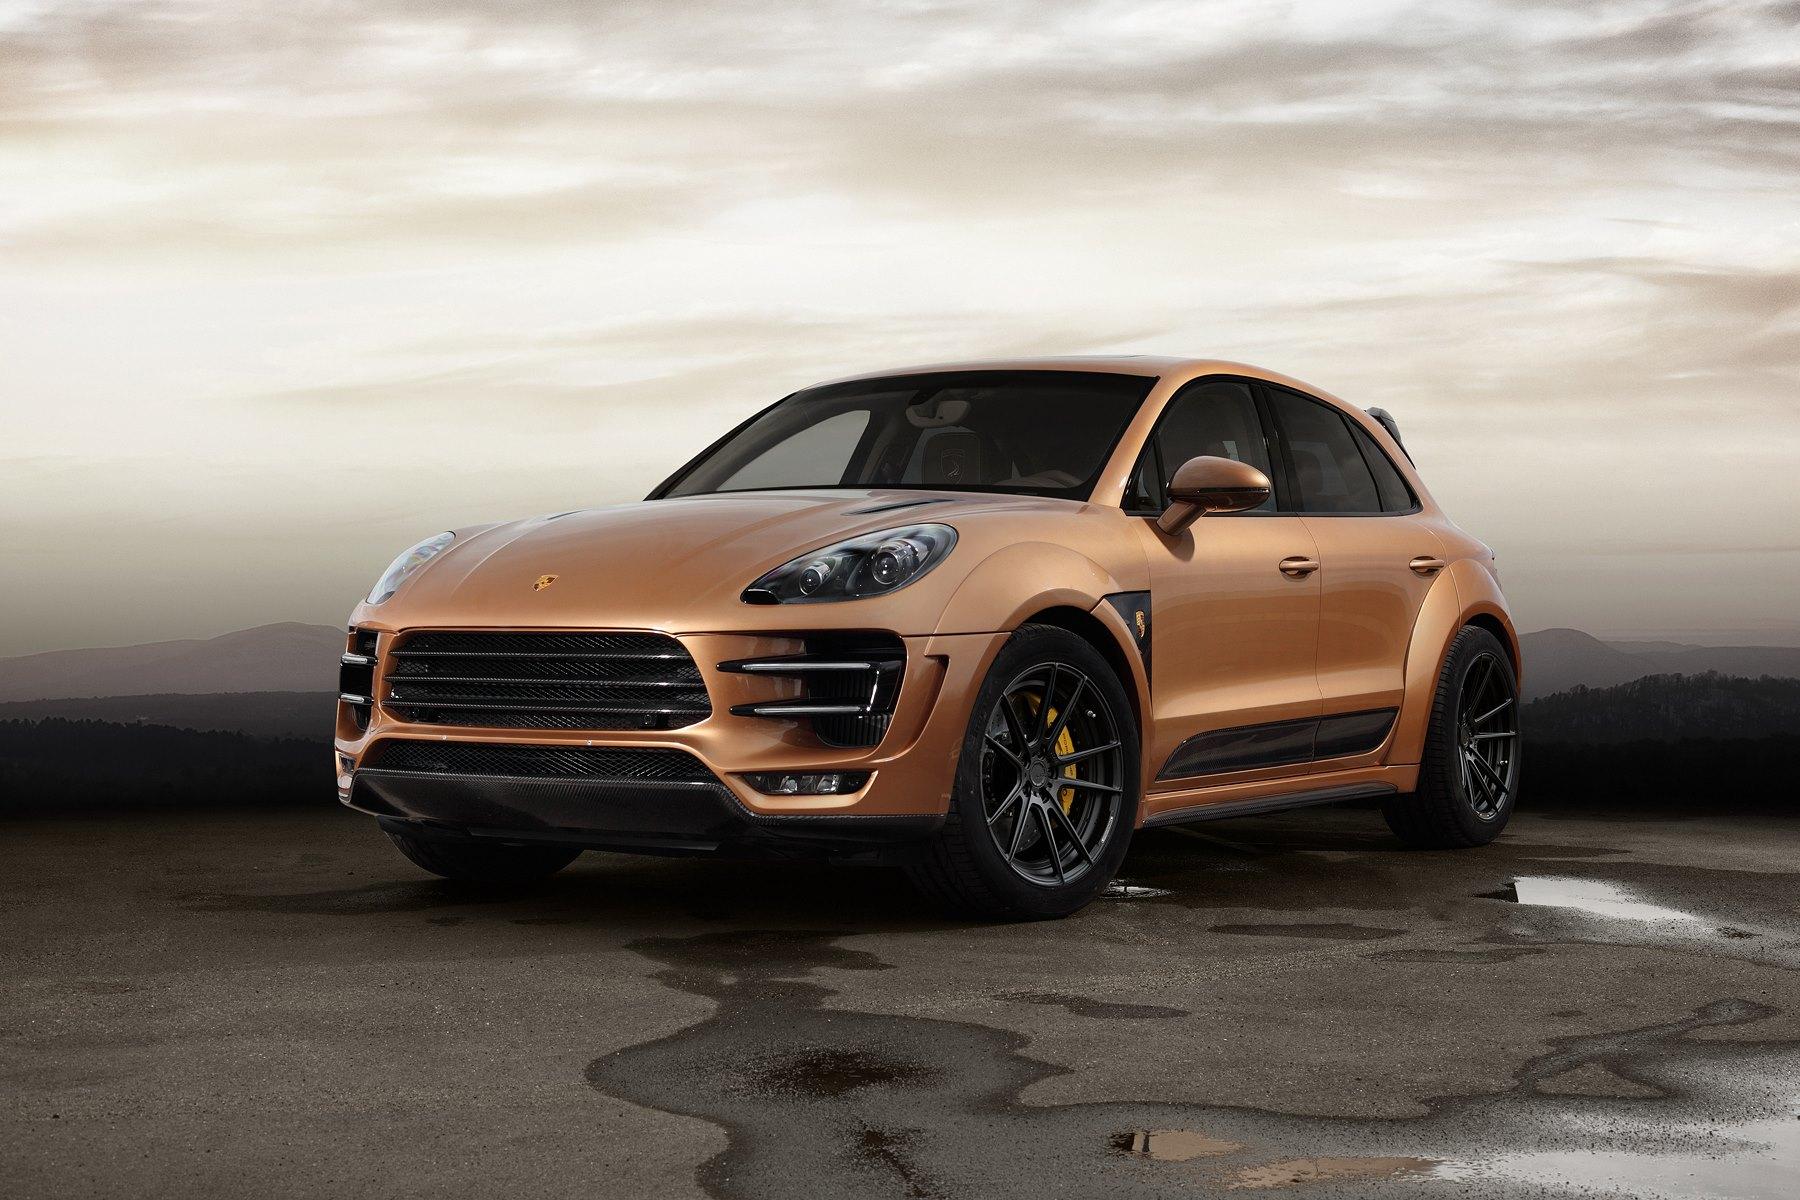 Porsche Macan Interior >> Macan URSA by Topcar Has Gold-Colored Carbon Fiber and ...